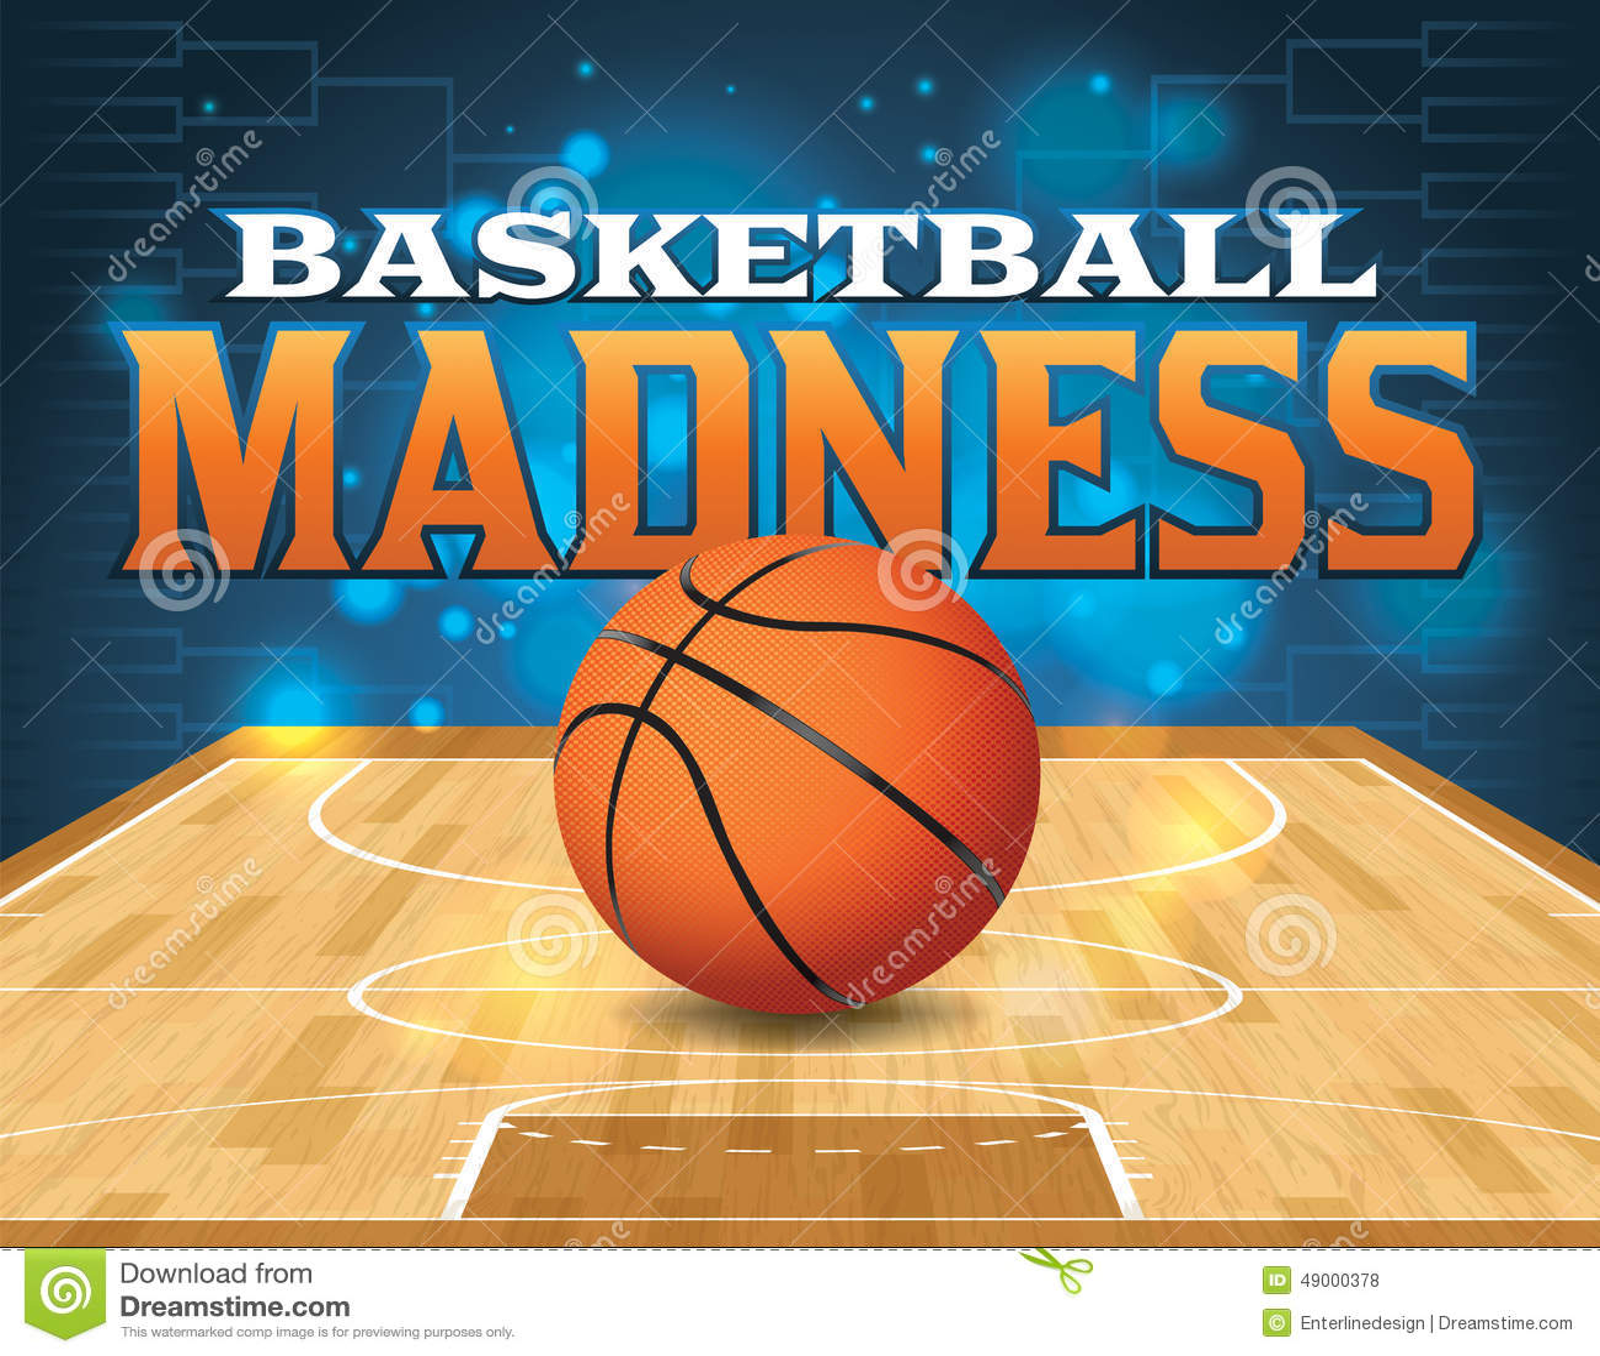 Basketball Tournament Flyer | Basketball Scores